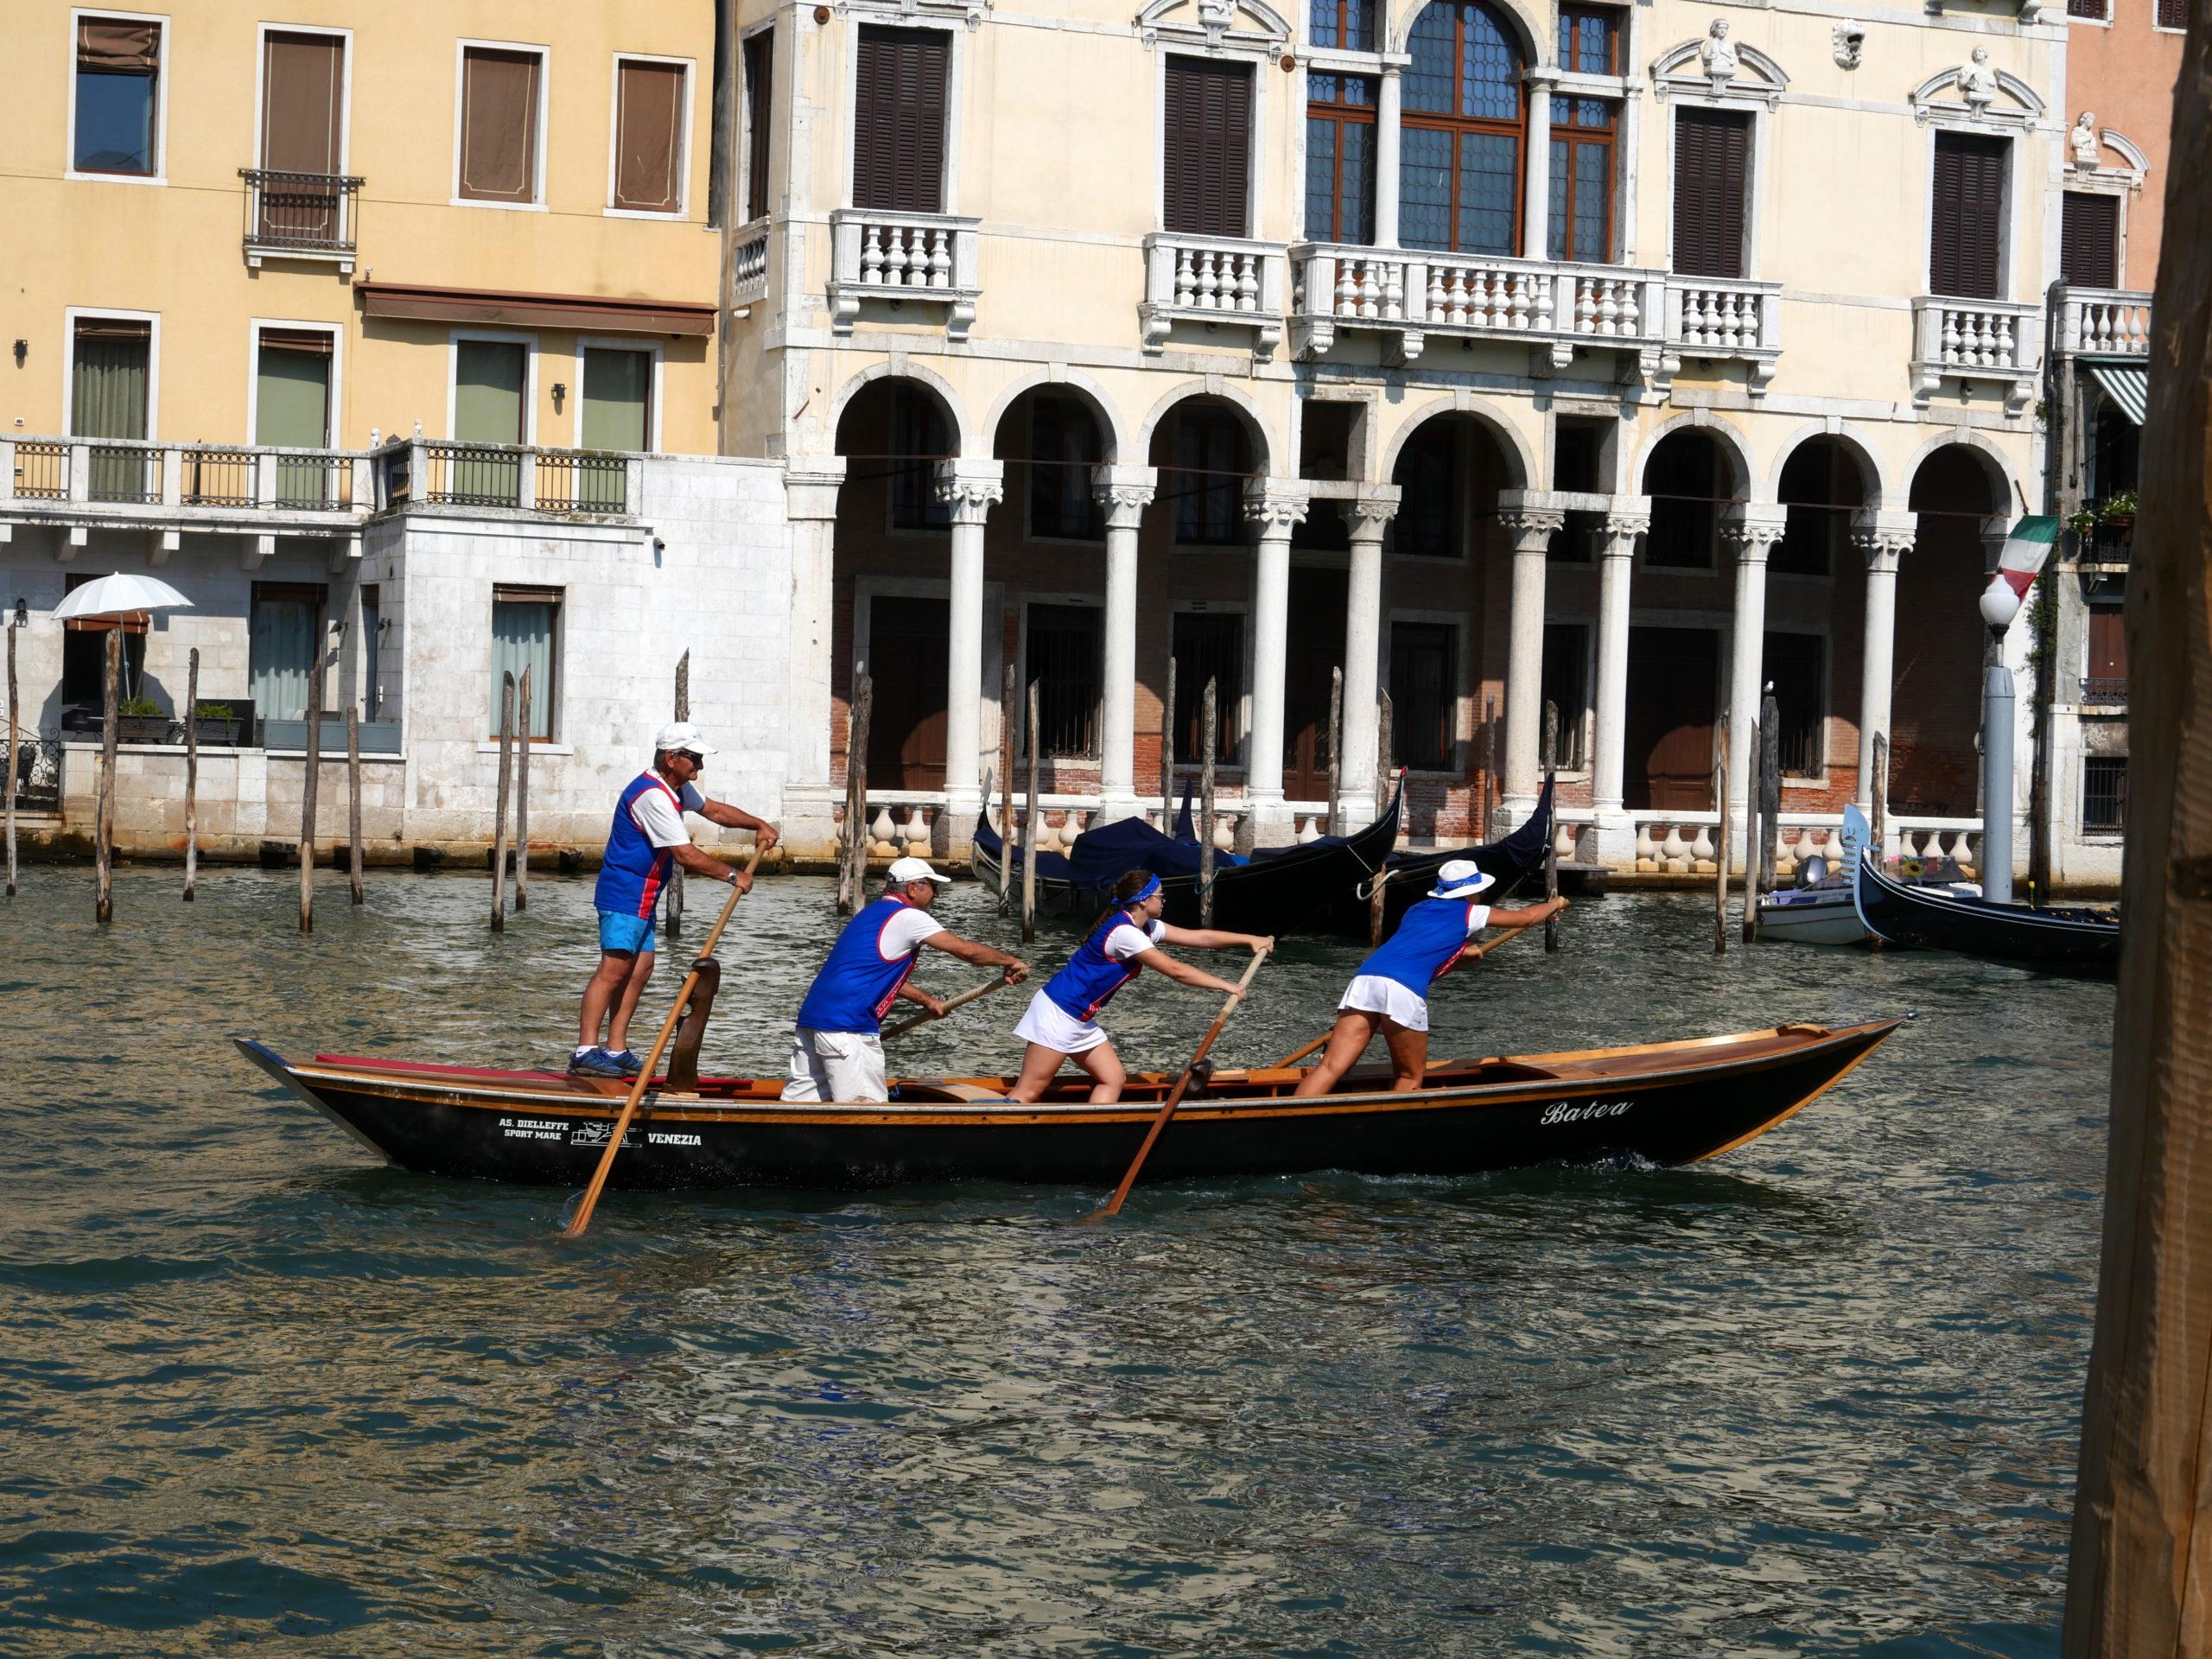 bateau 1 regata storica Venise